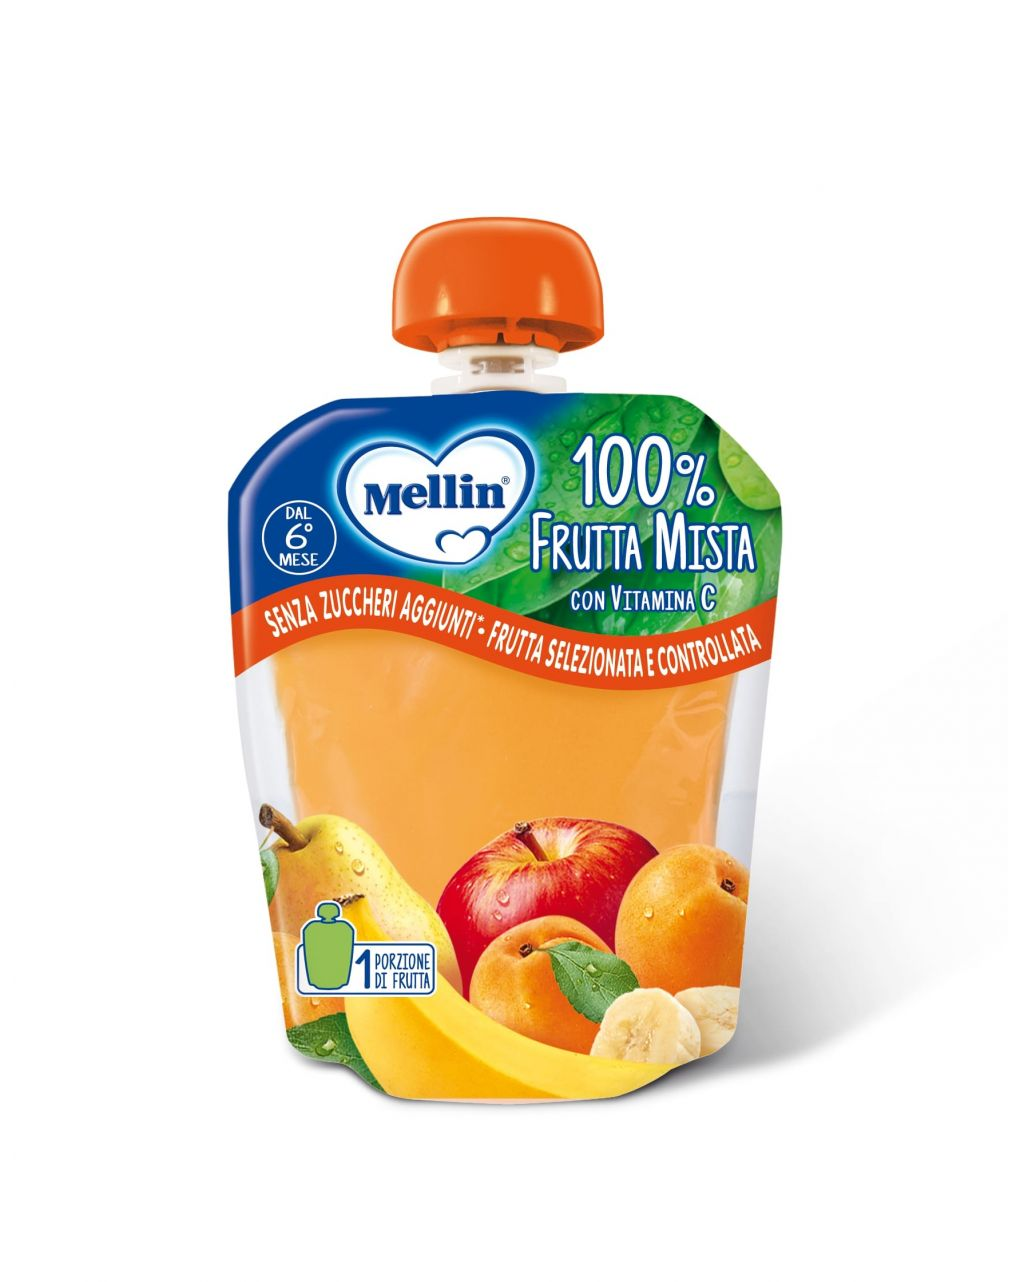 Mellin - pouch frutta mista 90g - Mellin